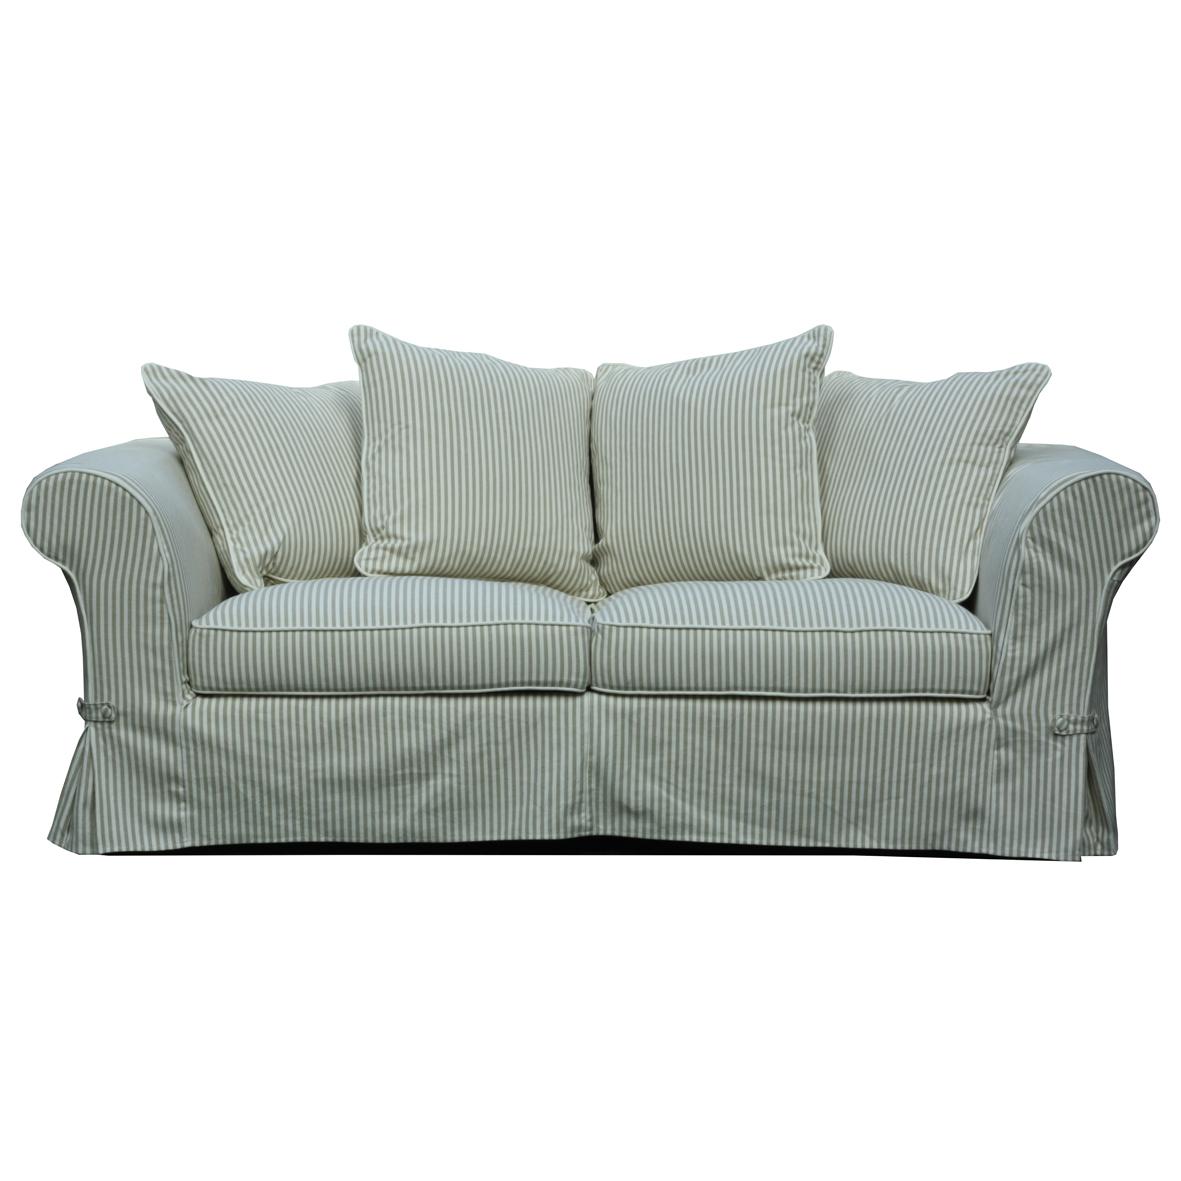 blue striped sofa uk best recliner 2018 brampton 3 seat light stripe mysmallspace